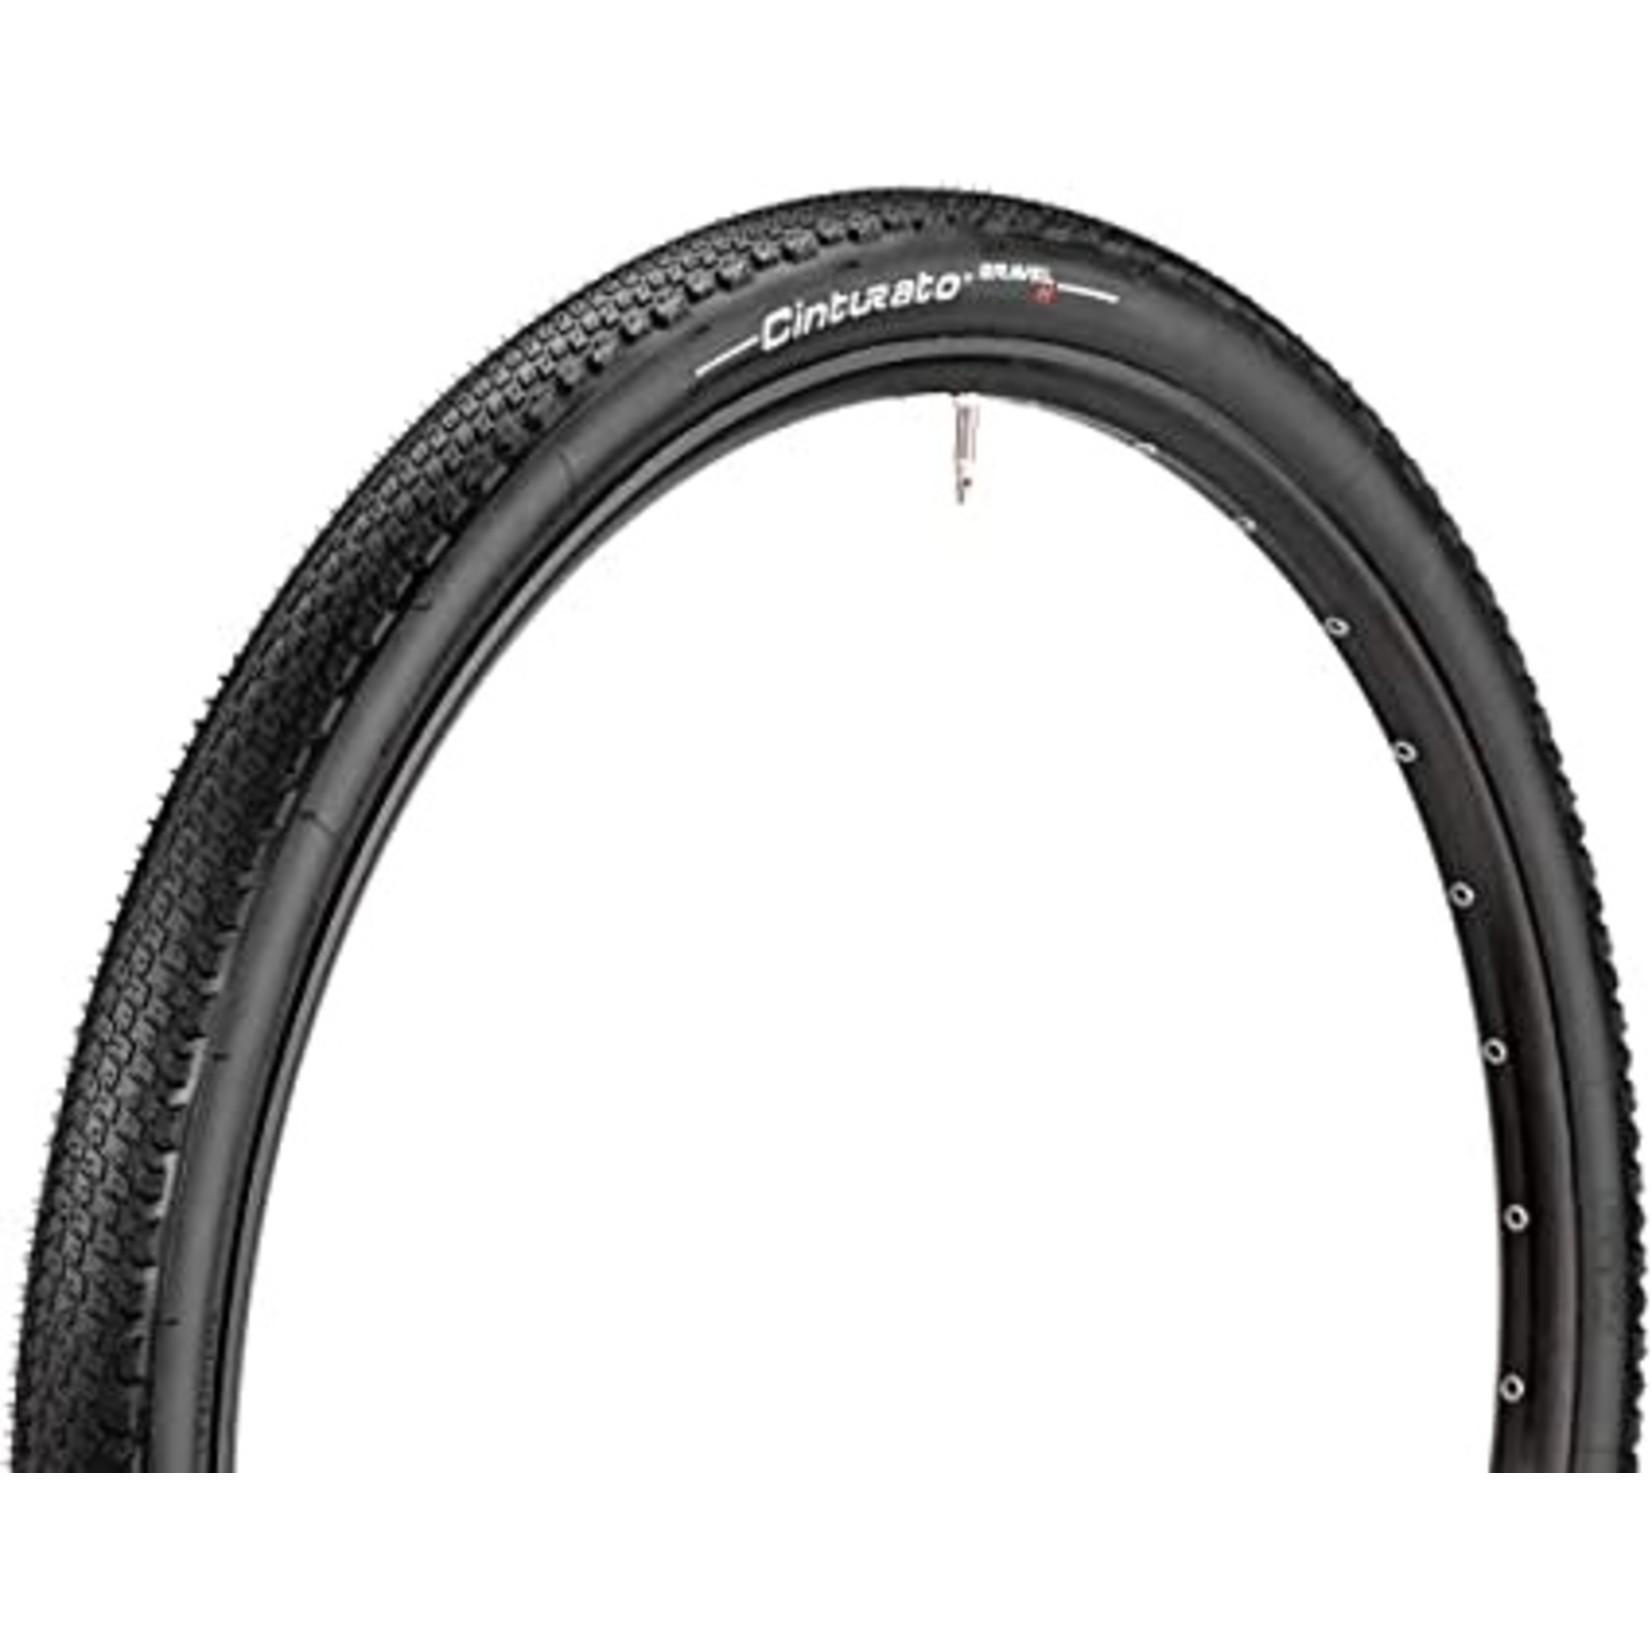 Pirelli Pirelli Cinturato Gravel H Folding Bead Tire, 700x40c